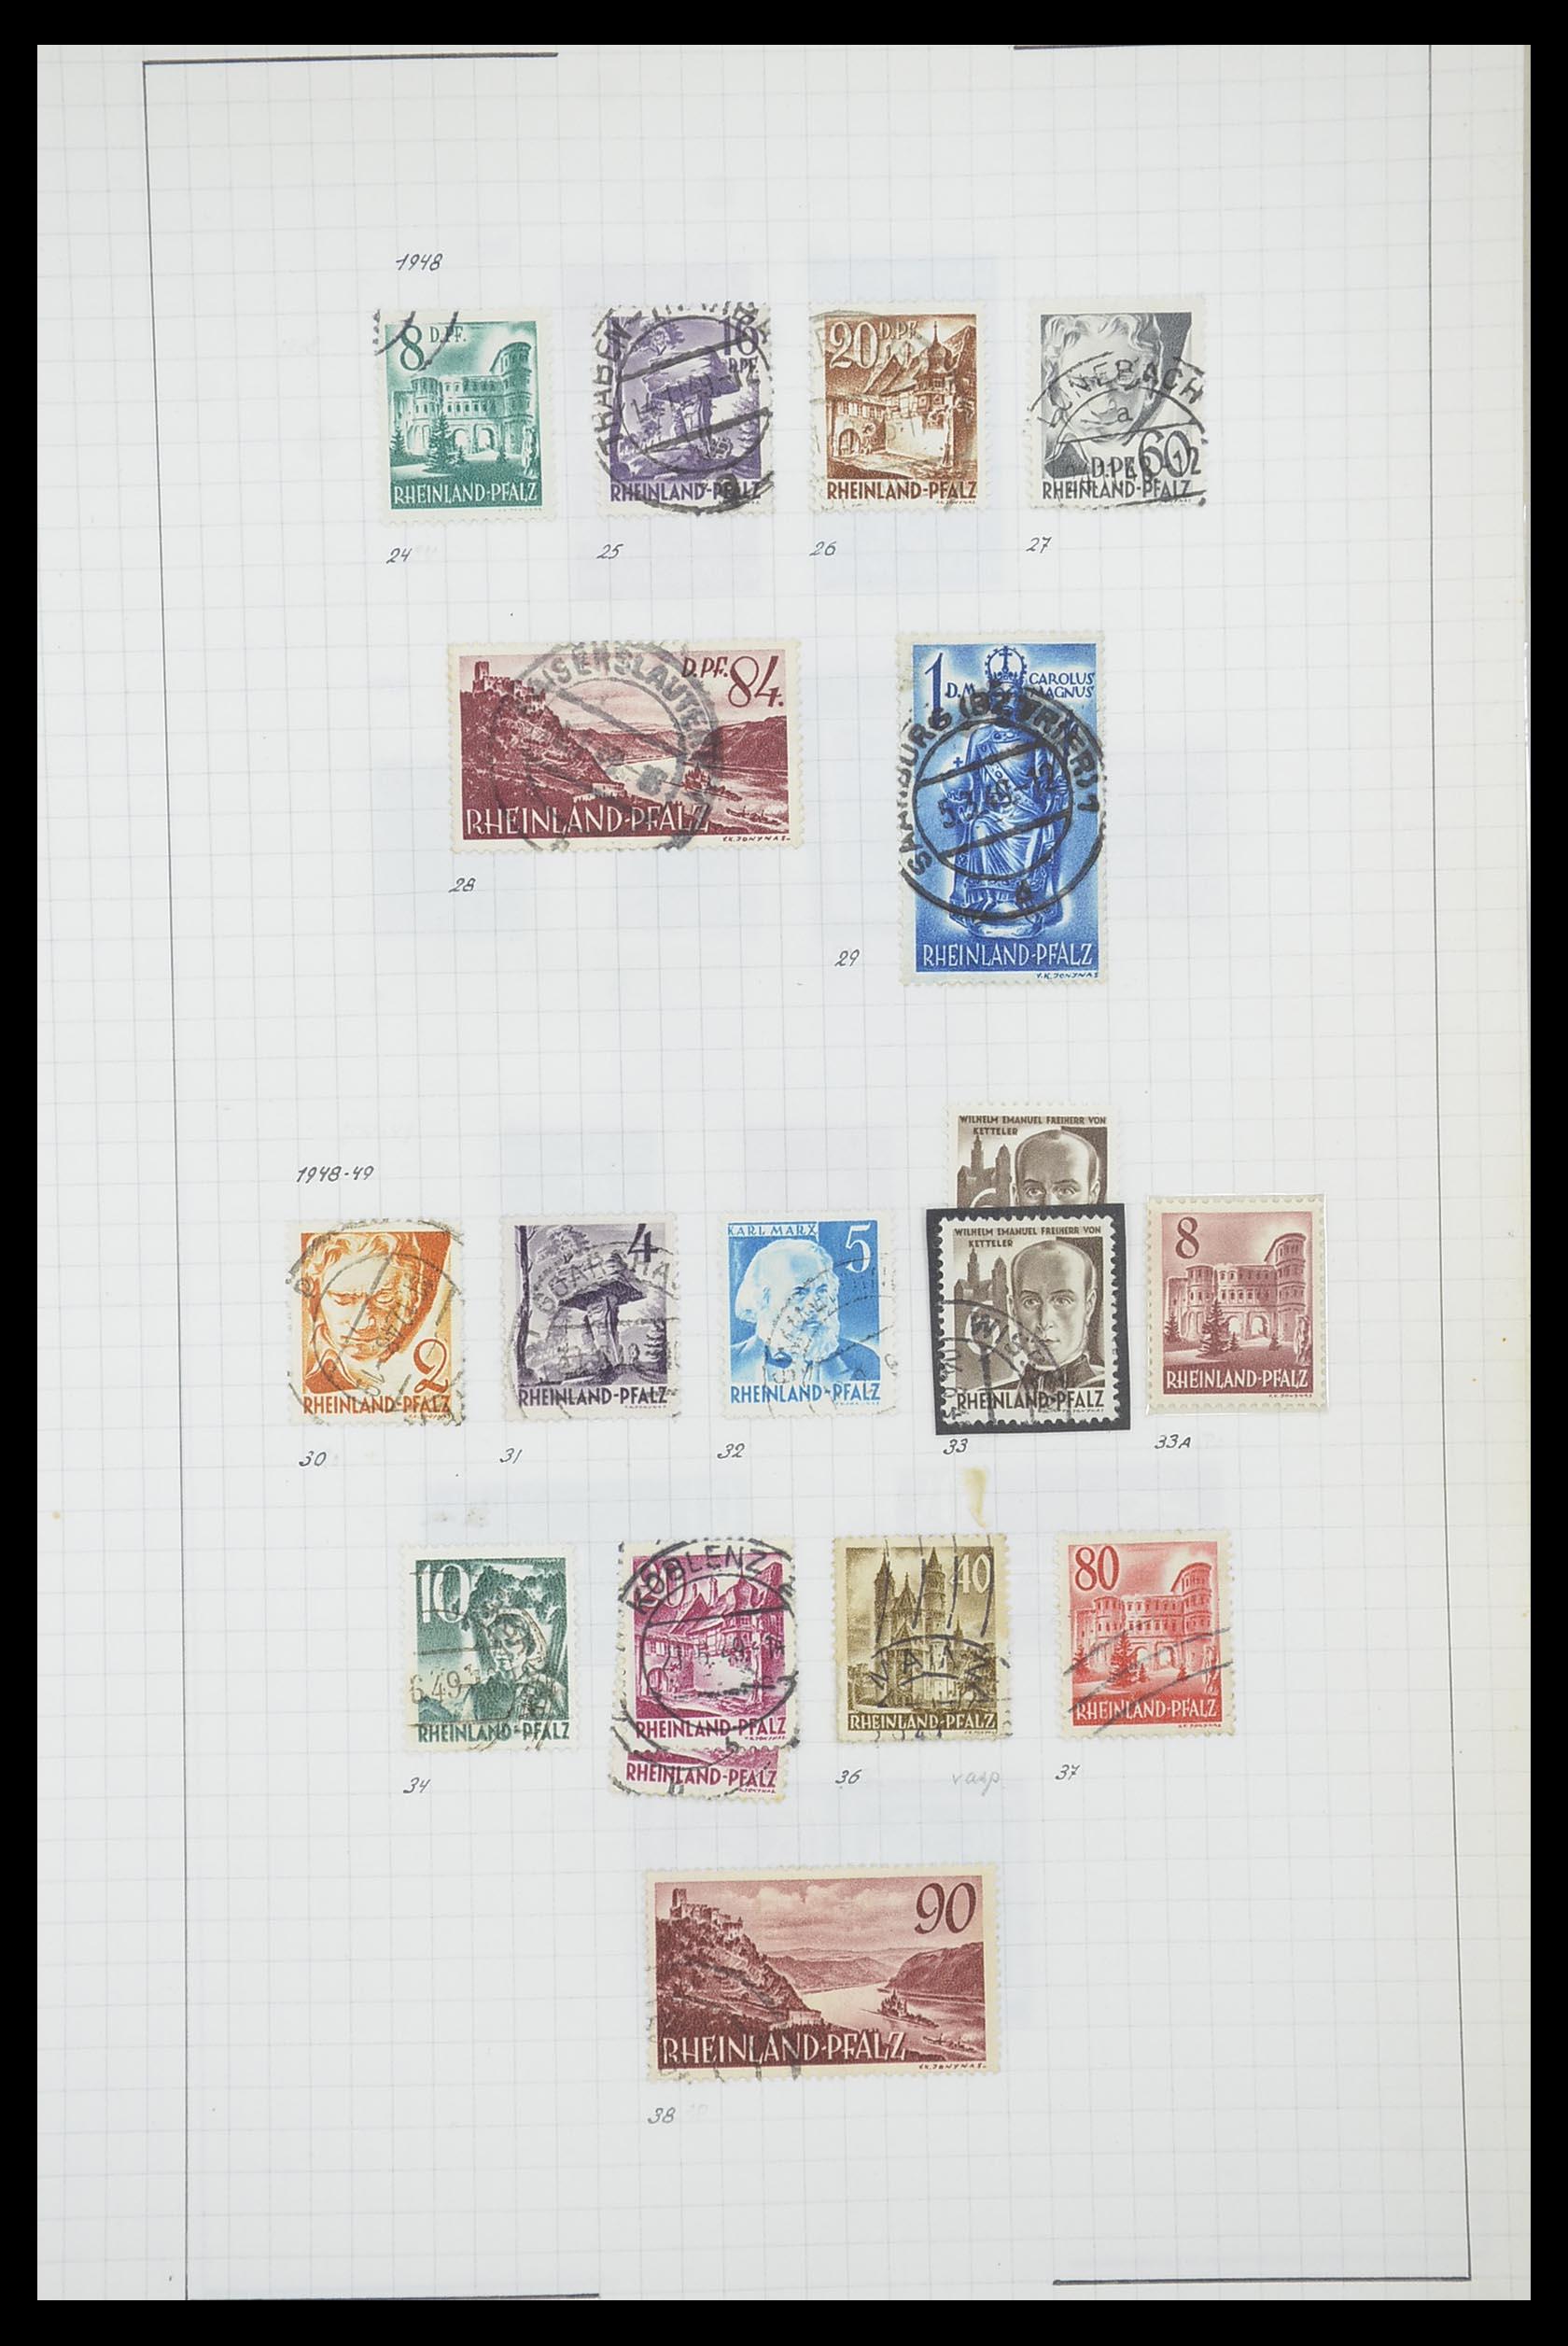 33864 016 - Postzegelverzameling 33864 Franse Zone 1945-1949.